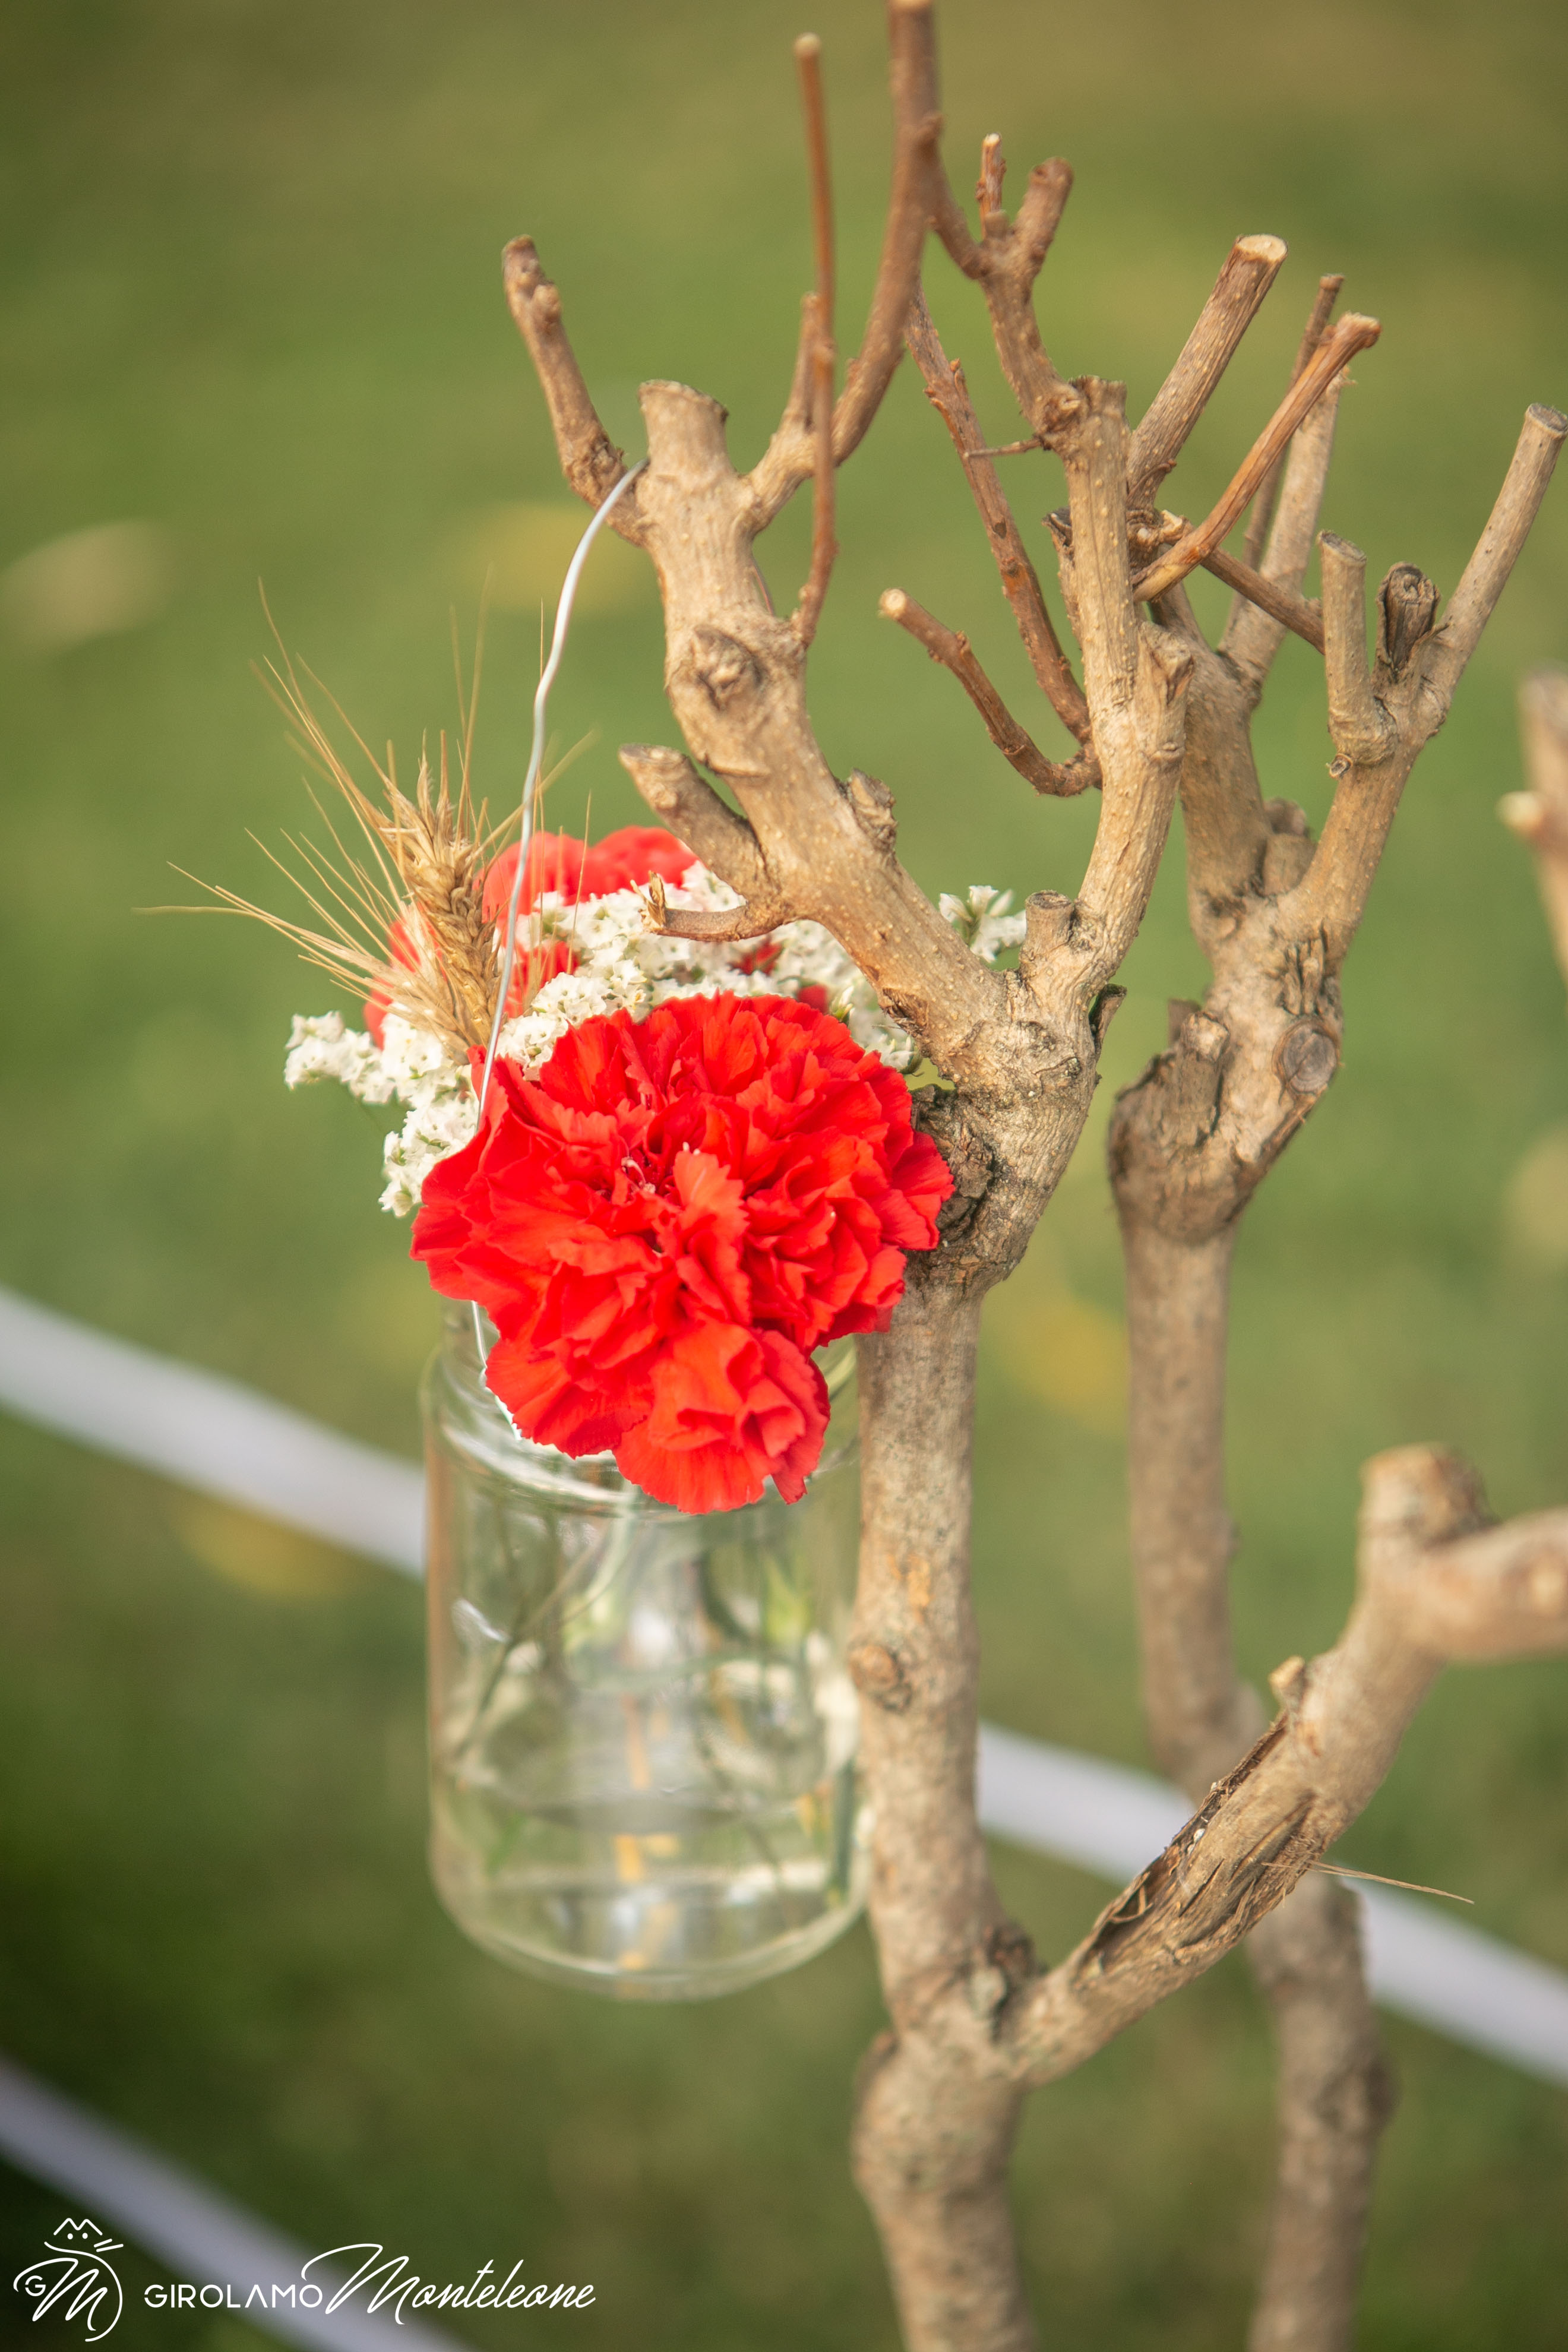 WEDDING_TENUTA_DI_POLLINE_ELI_E_CLAUDIO_girolamomonteleoen.com2018luglio141833330387